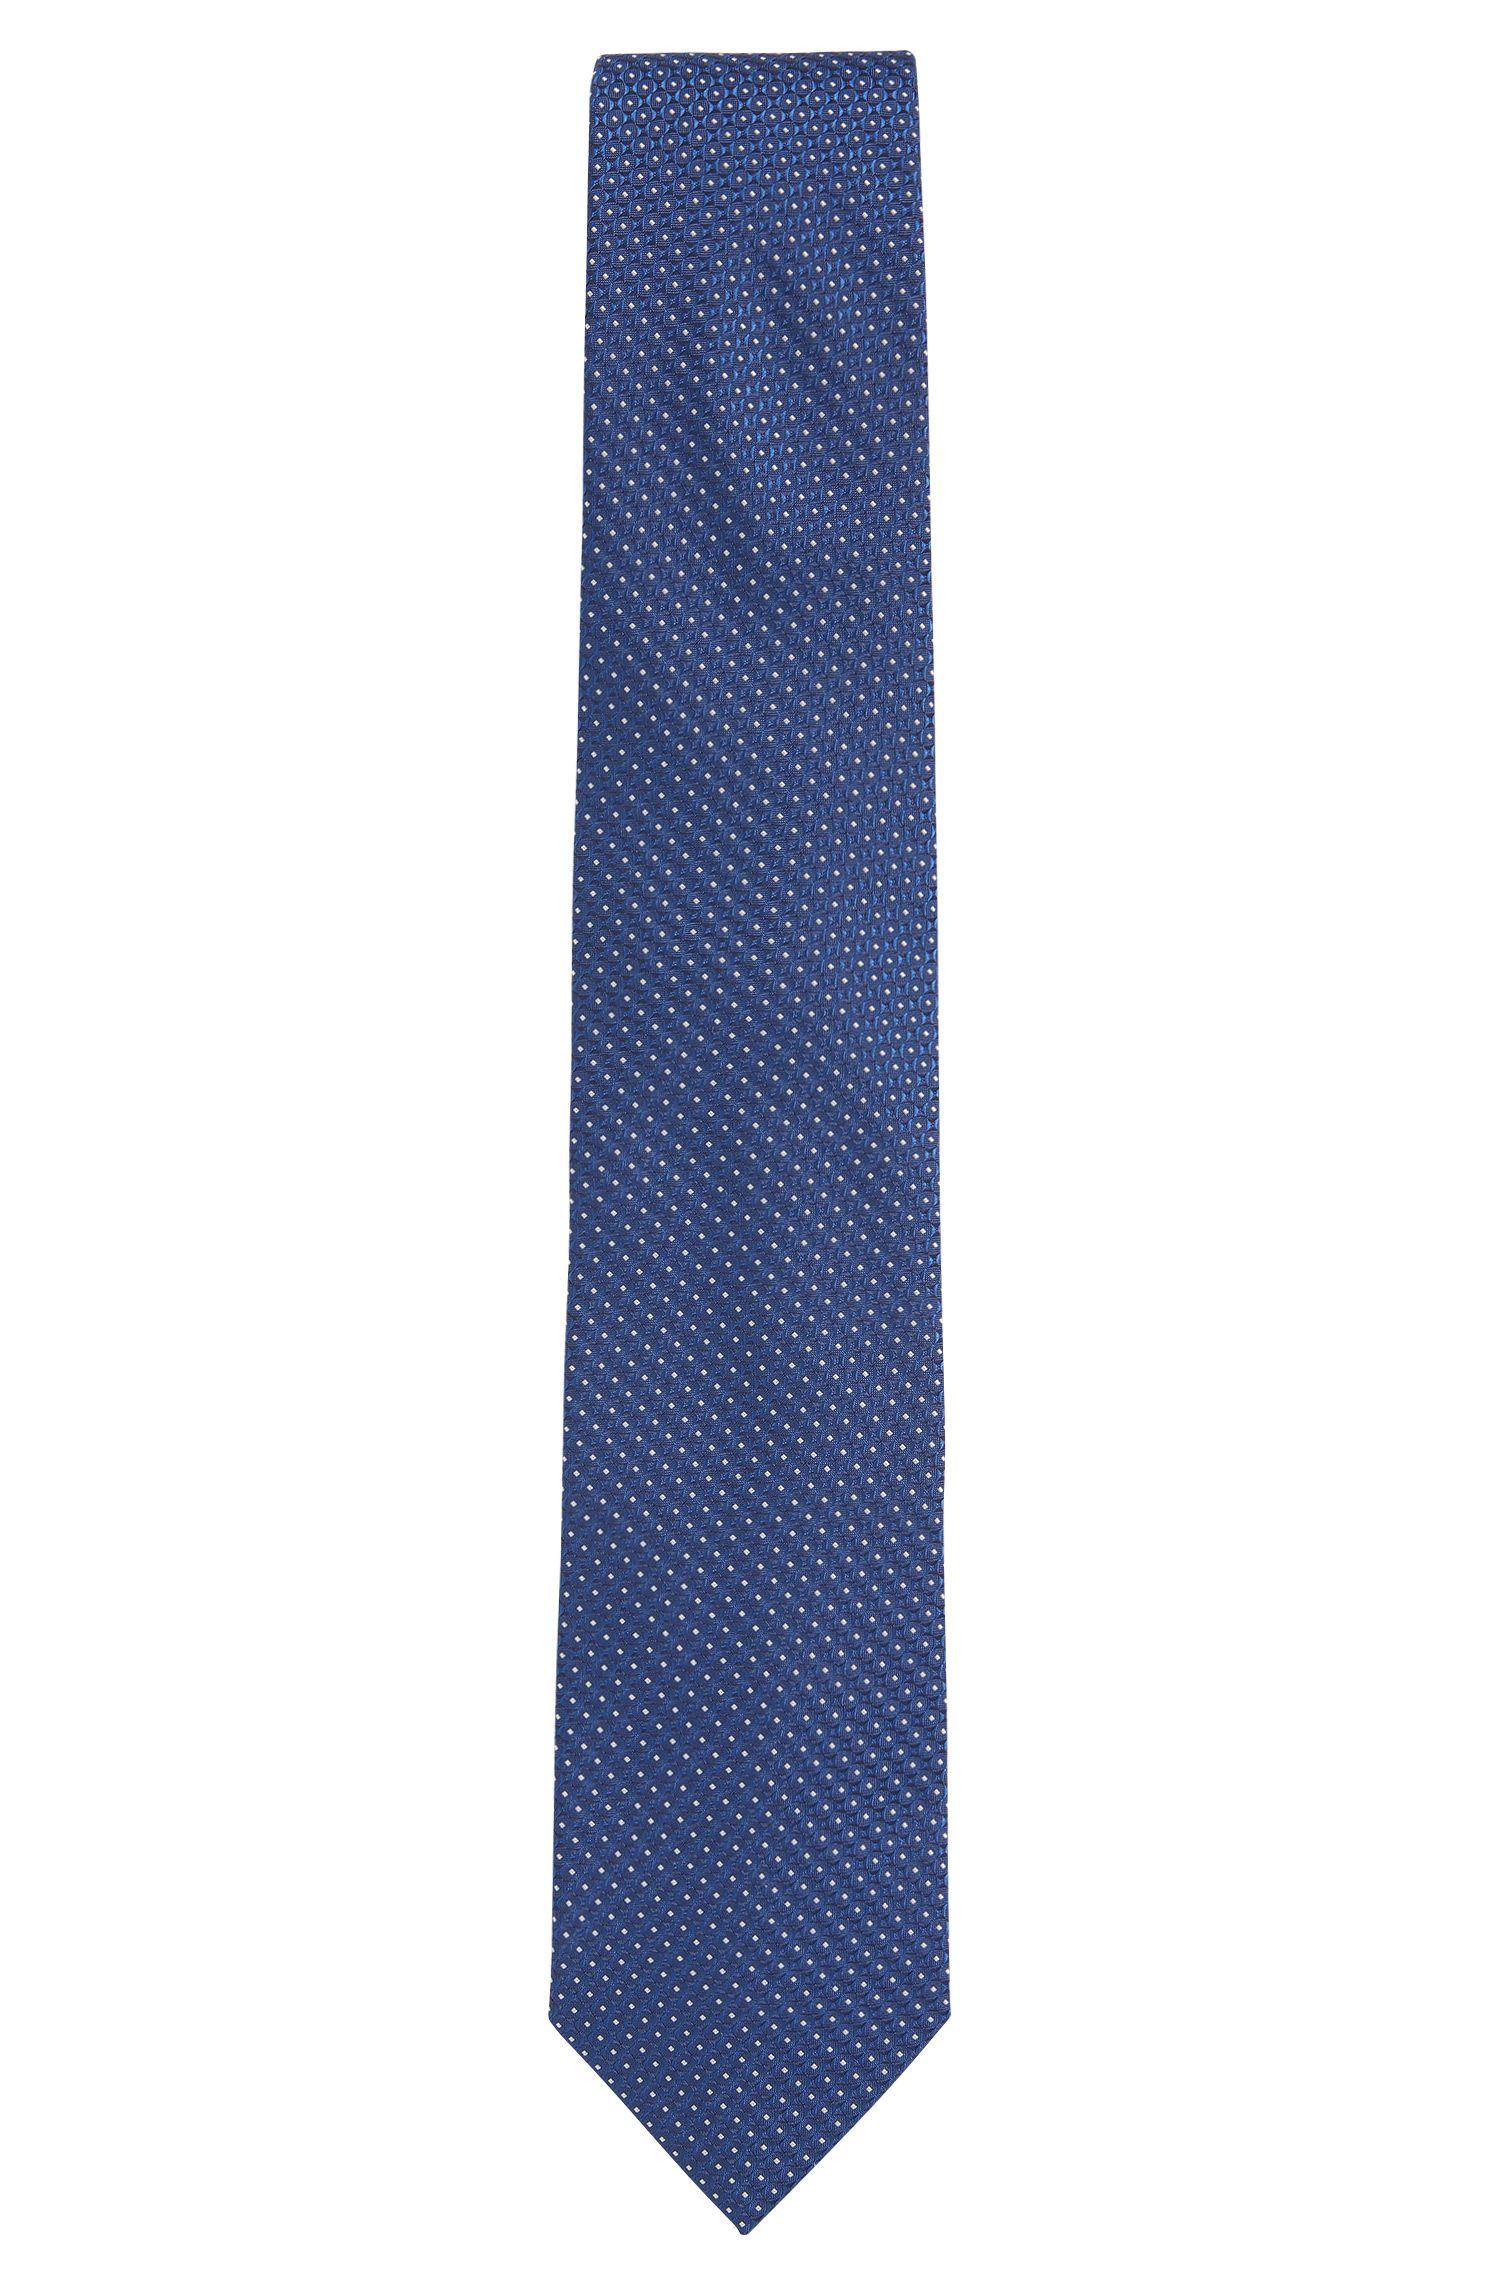 Corbata de jacquard en seda con estampado fabricada en Italia